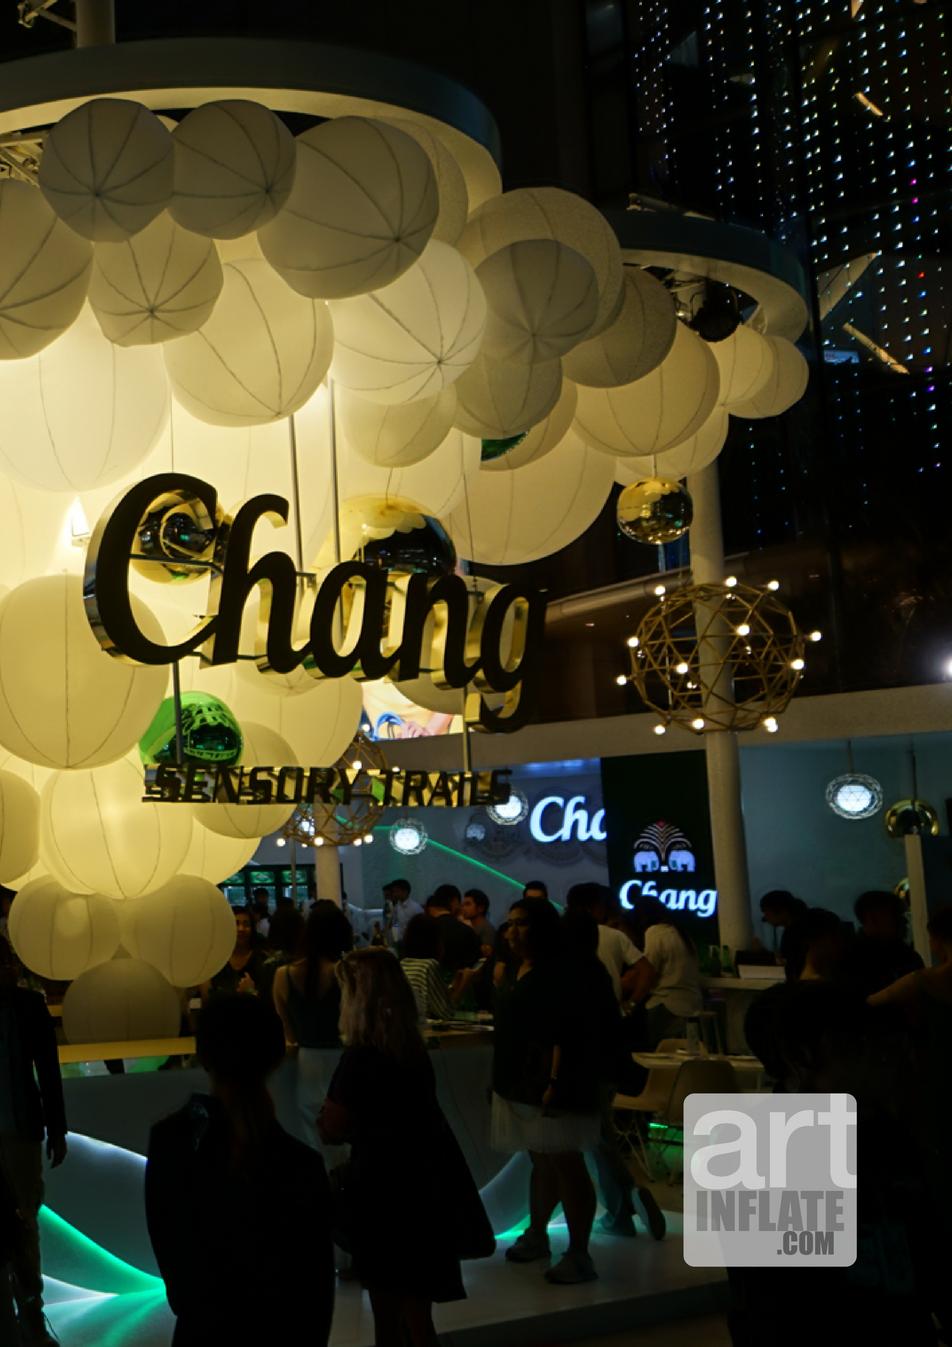 04.Chang Bubble Balloon-03.png